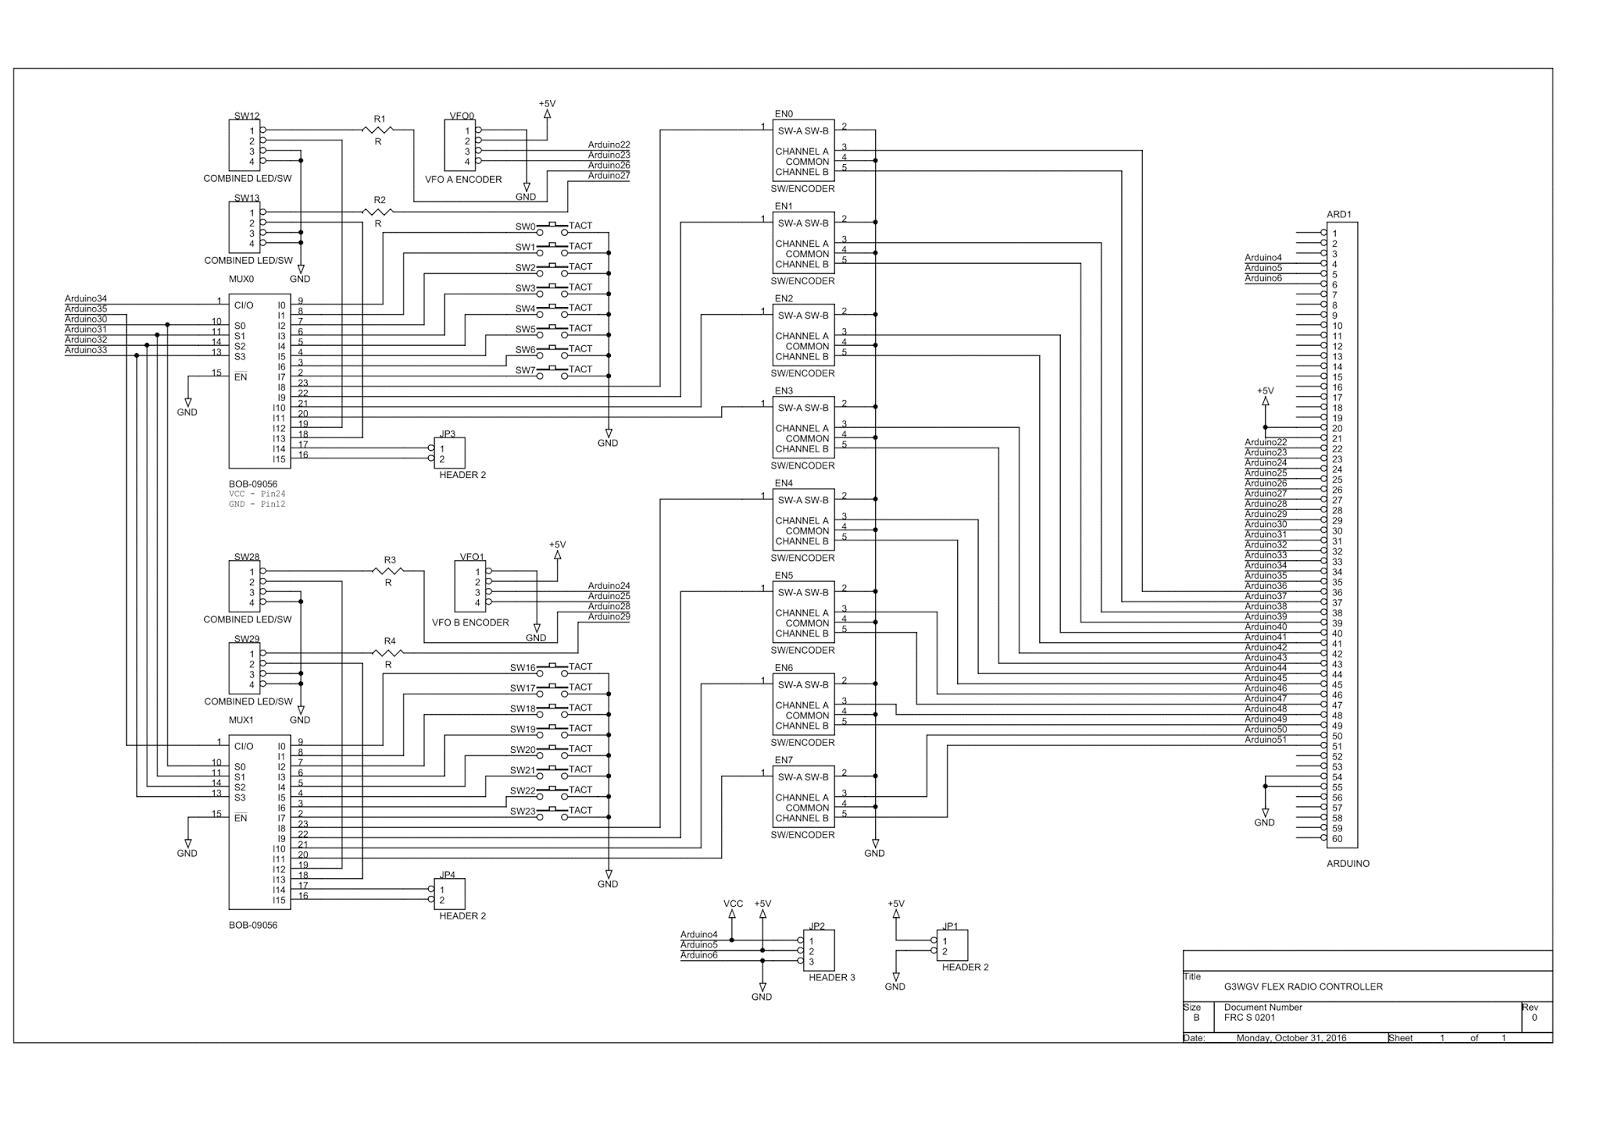 G3wgv S Flex Radio Controller Mk Ii Pcb Design